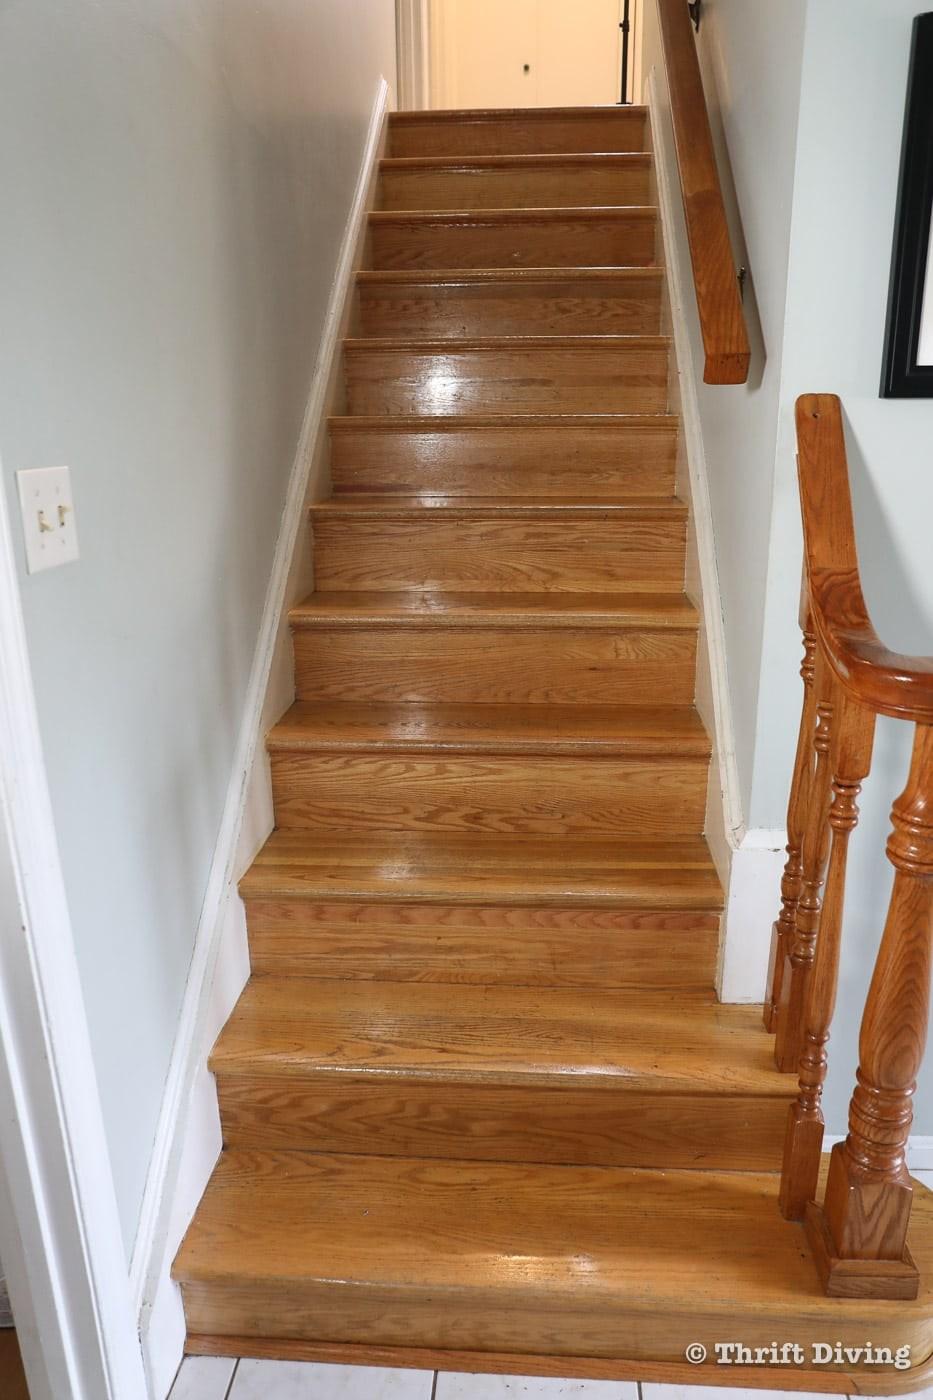 How To Install A Stair Runner Step By Step Tutorial Video   Stair Runners For Sale   Flooring   Stair Tread   Rug   Stair Carpet Runners   Tartan